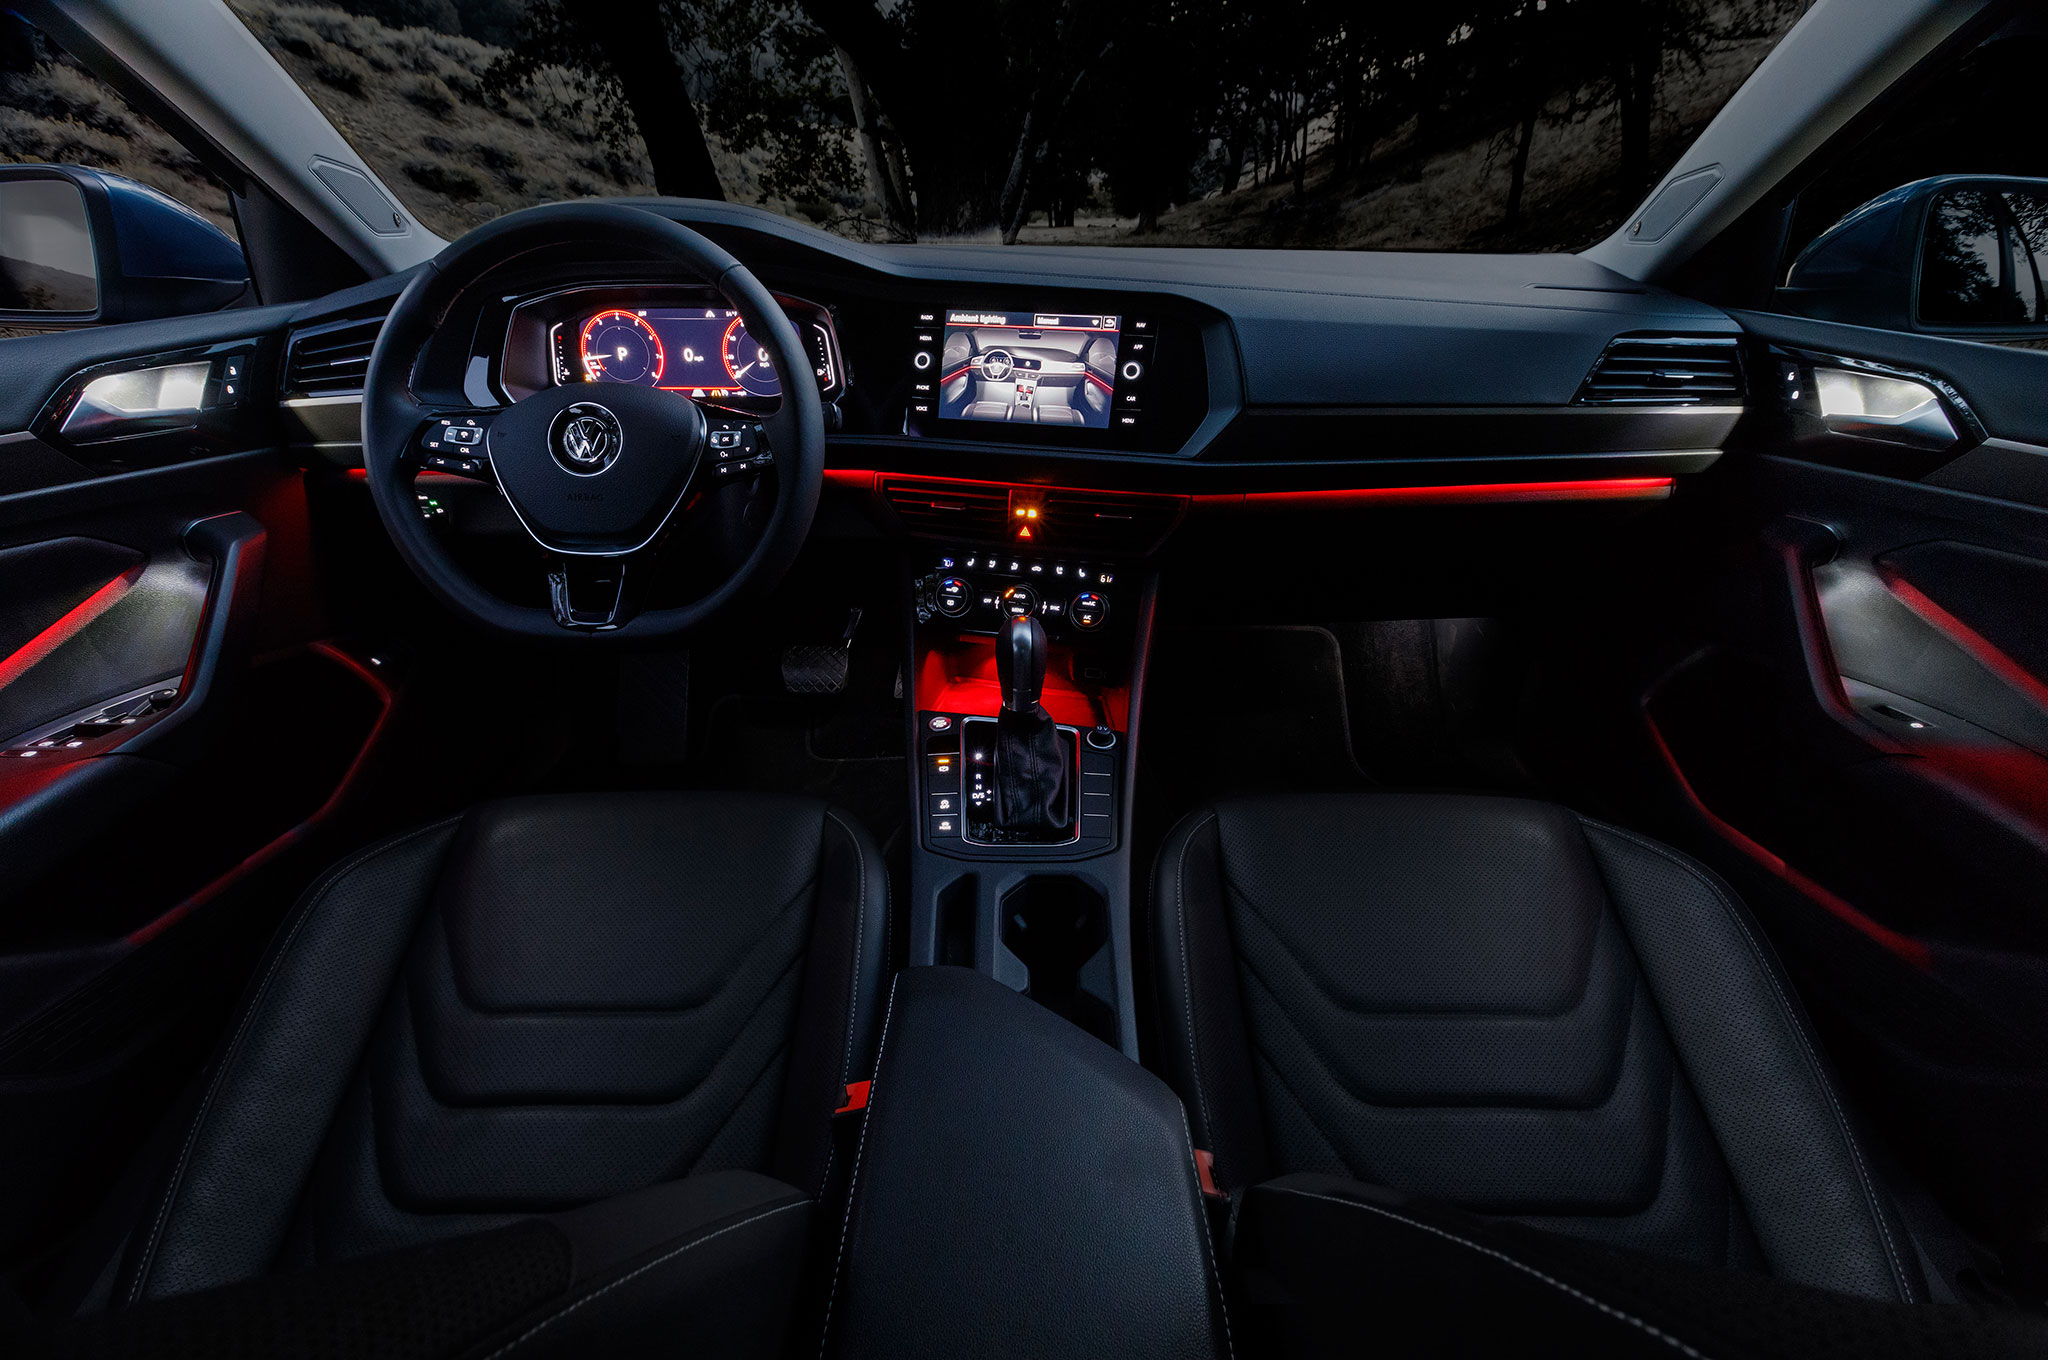 2019 volkswagen jetta starts at 19 395 automobile magazine. Black Bedroom Furniture Sets. Home Design Ideas